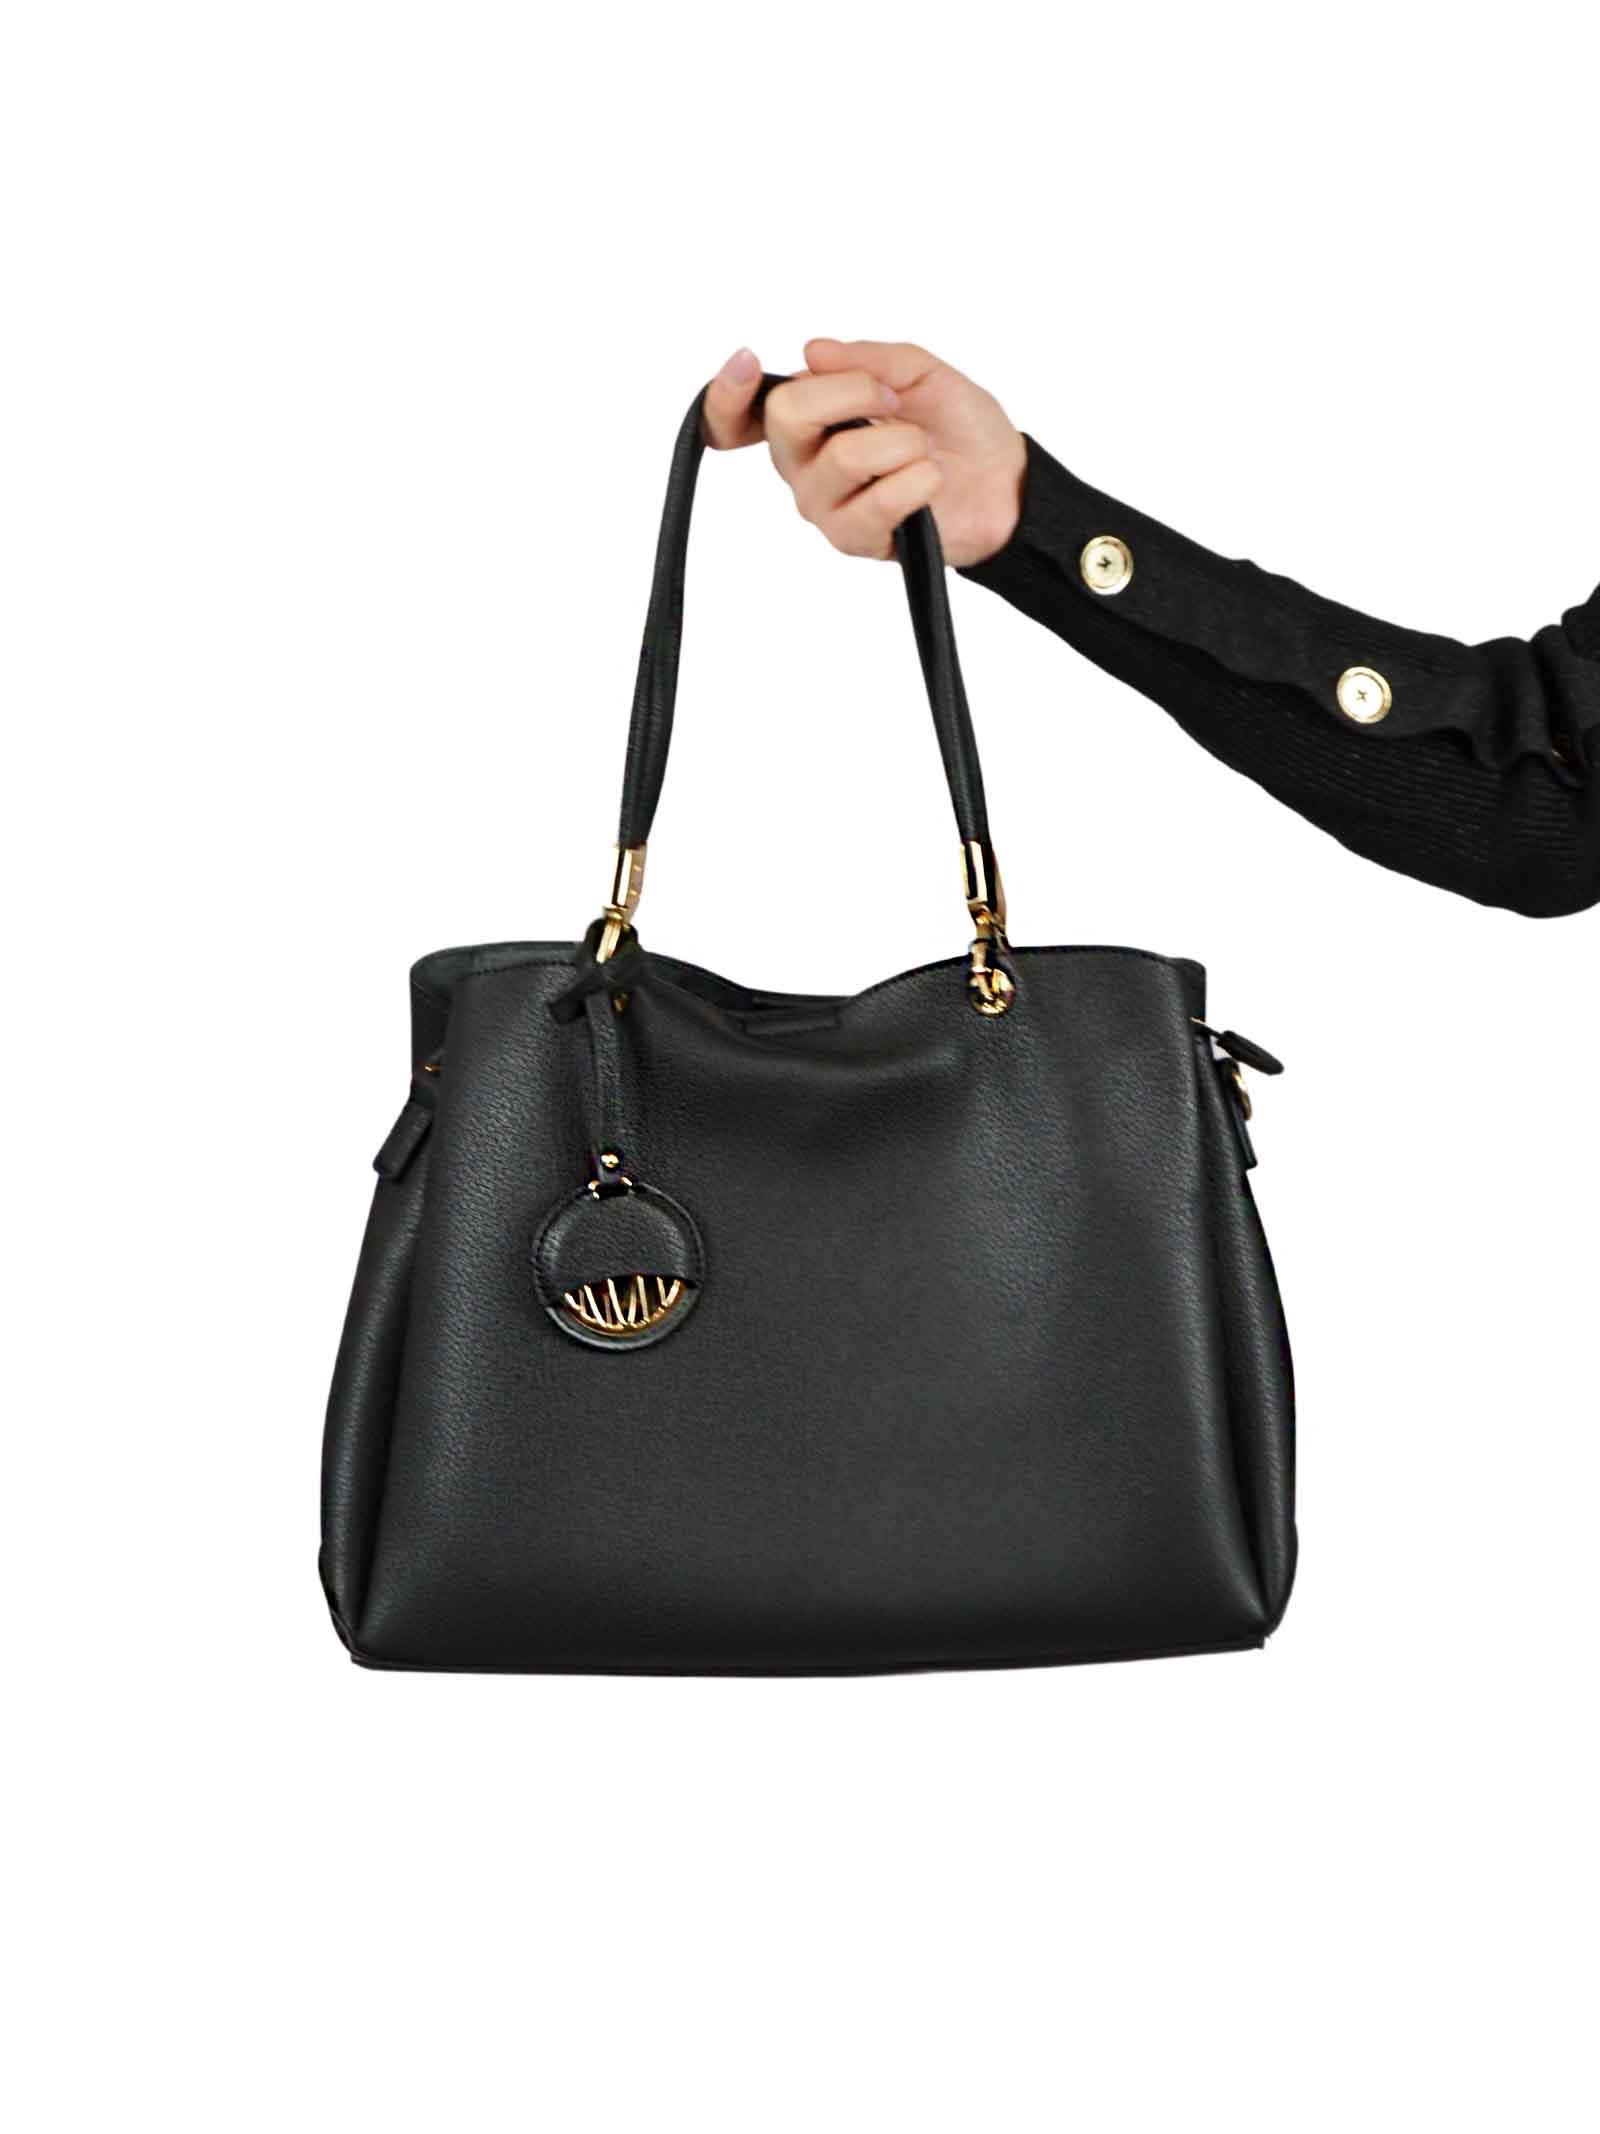 Top handle bag in soft leather GAUDI borse |  | V0A-71500BLACK